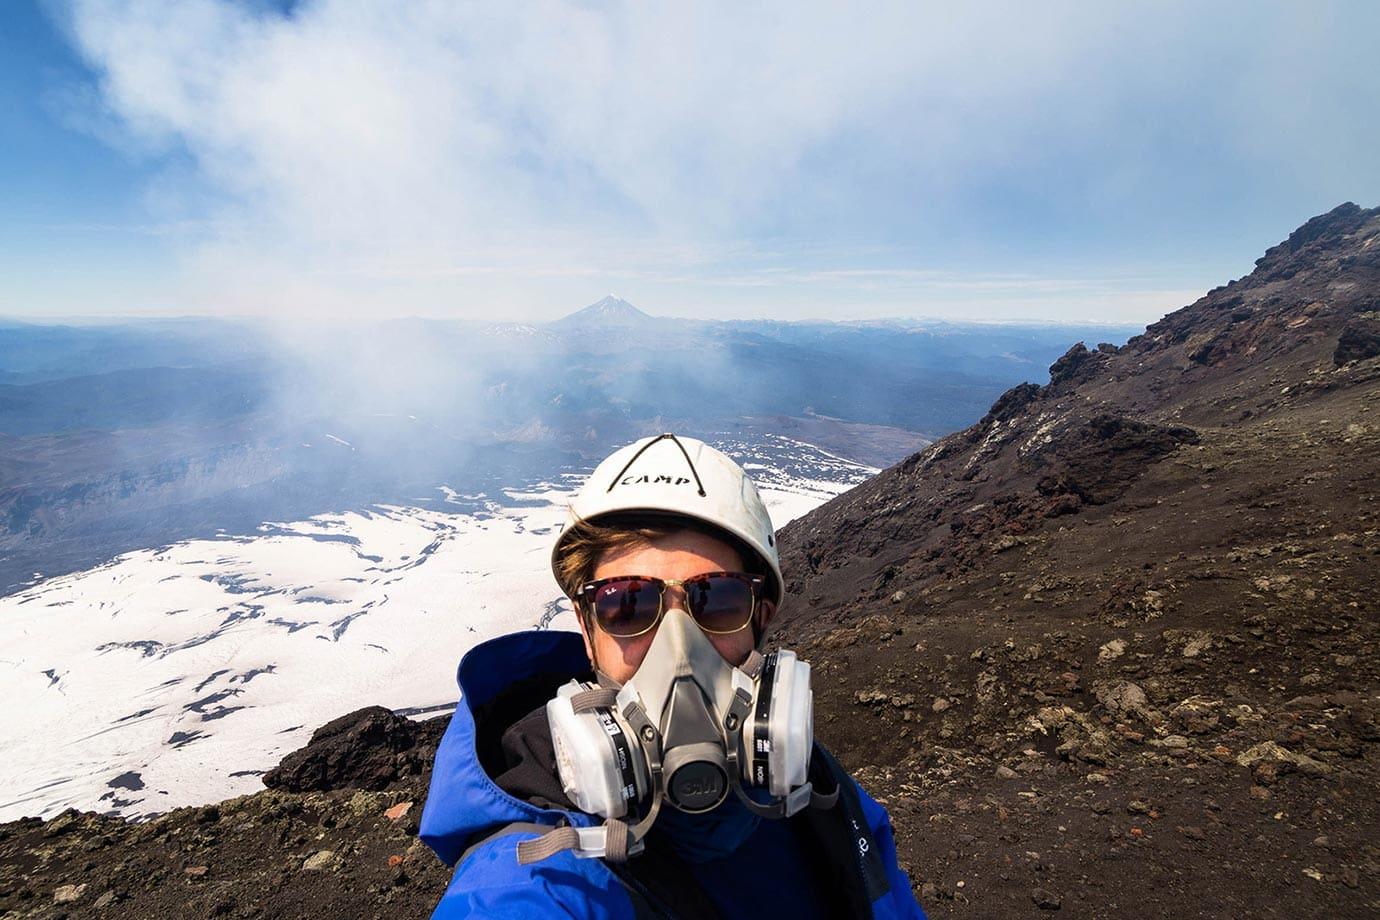 At the top of Volcano Villarrica